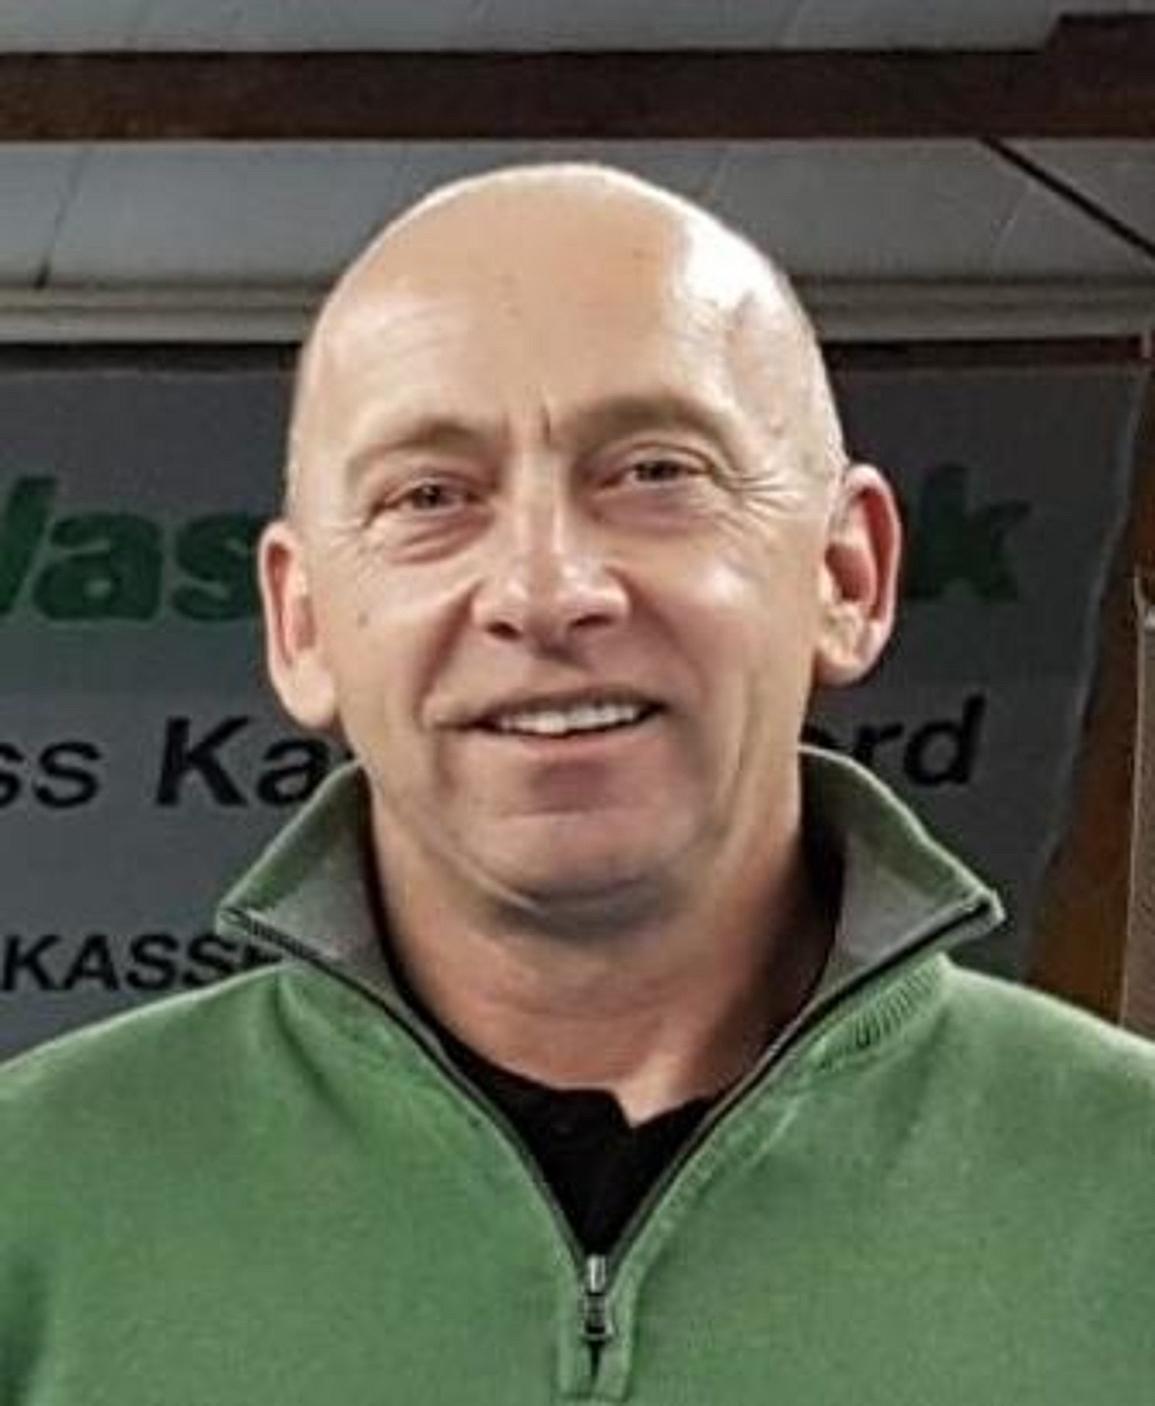 Markus Pape